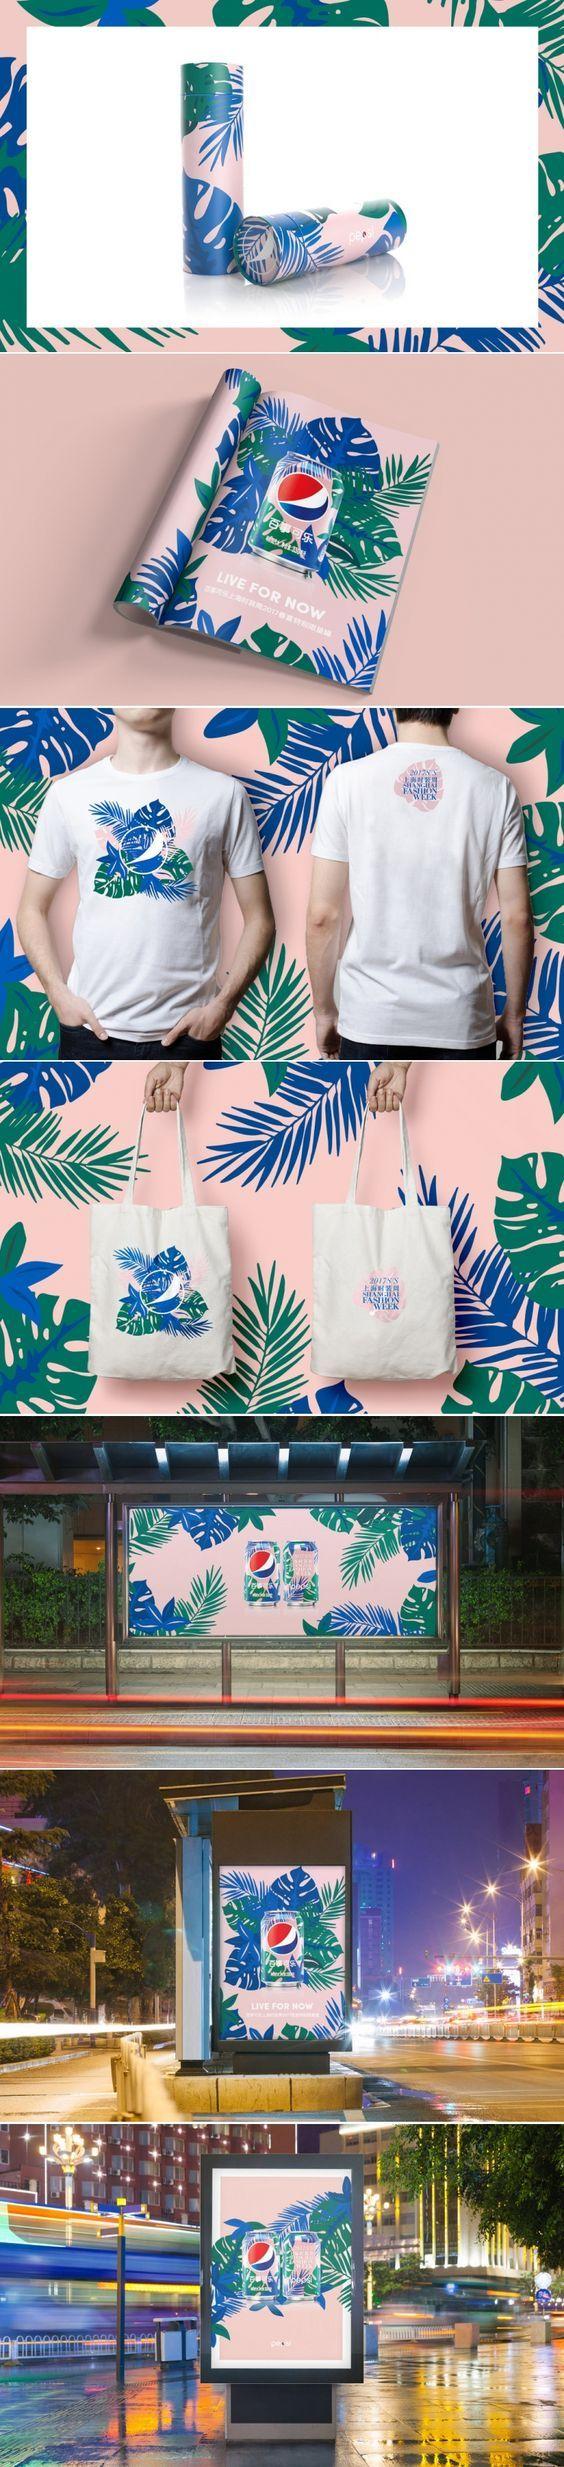 Pepsi X Shanghai Fashion Week Branding by Pepsi | Fivestar Branding Agency – Design and Branding Agency & Curated Inspiration Gallery